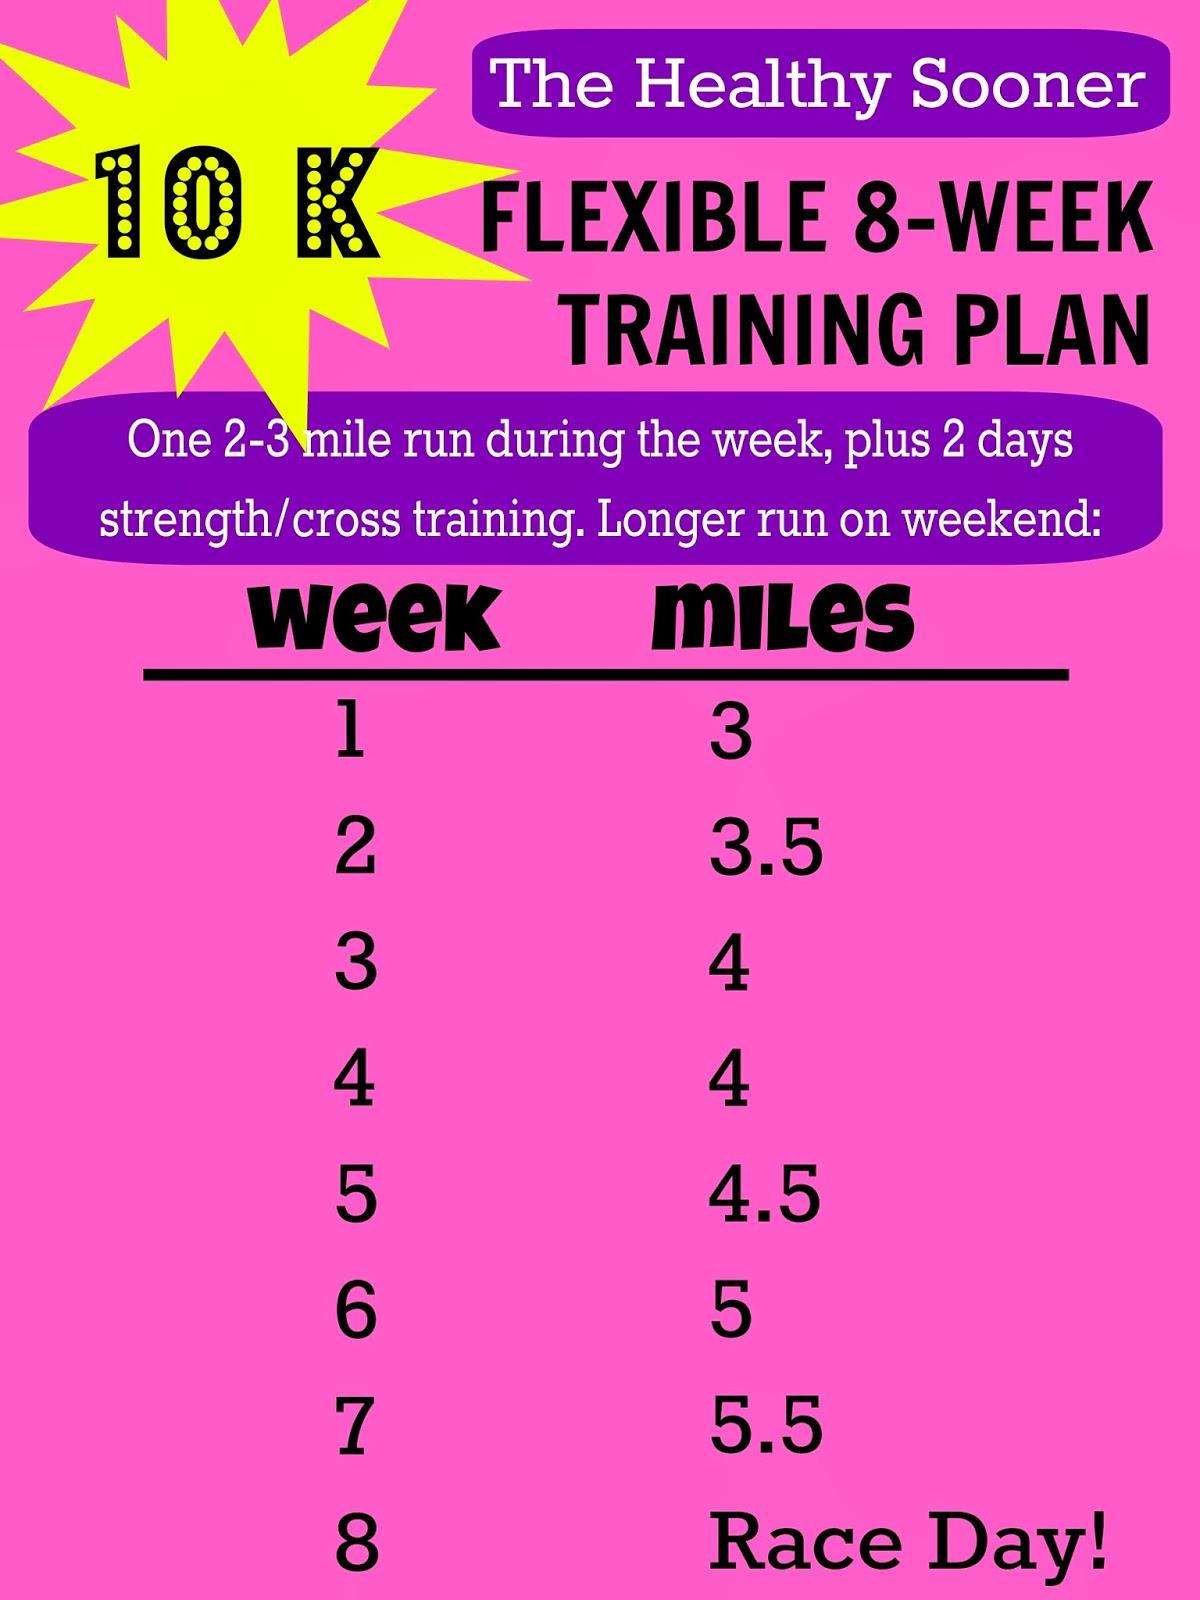 The Healthy Sooner: My 10k Training Plans